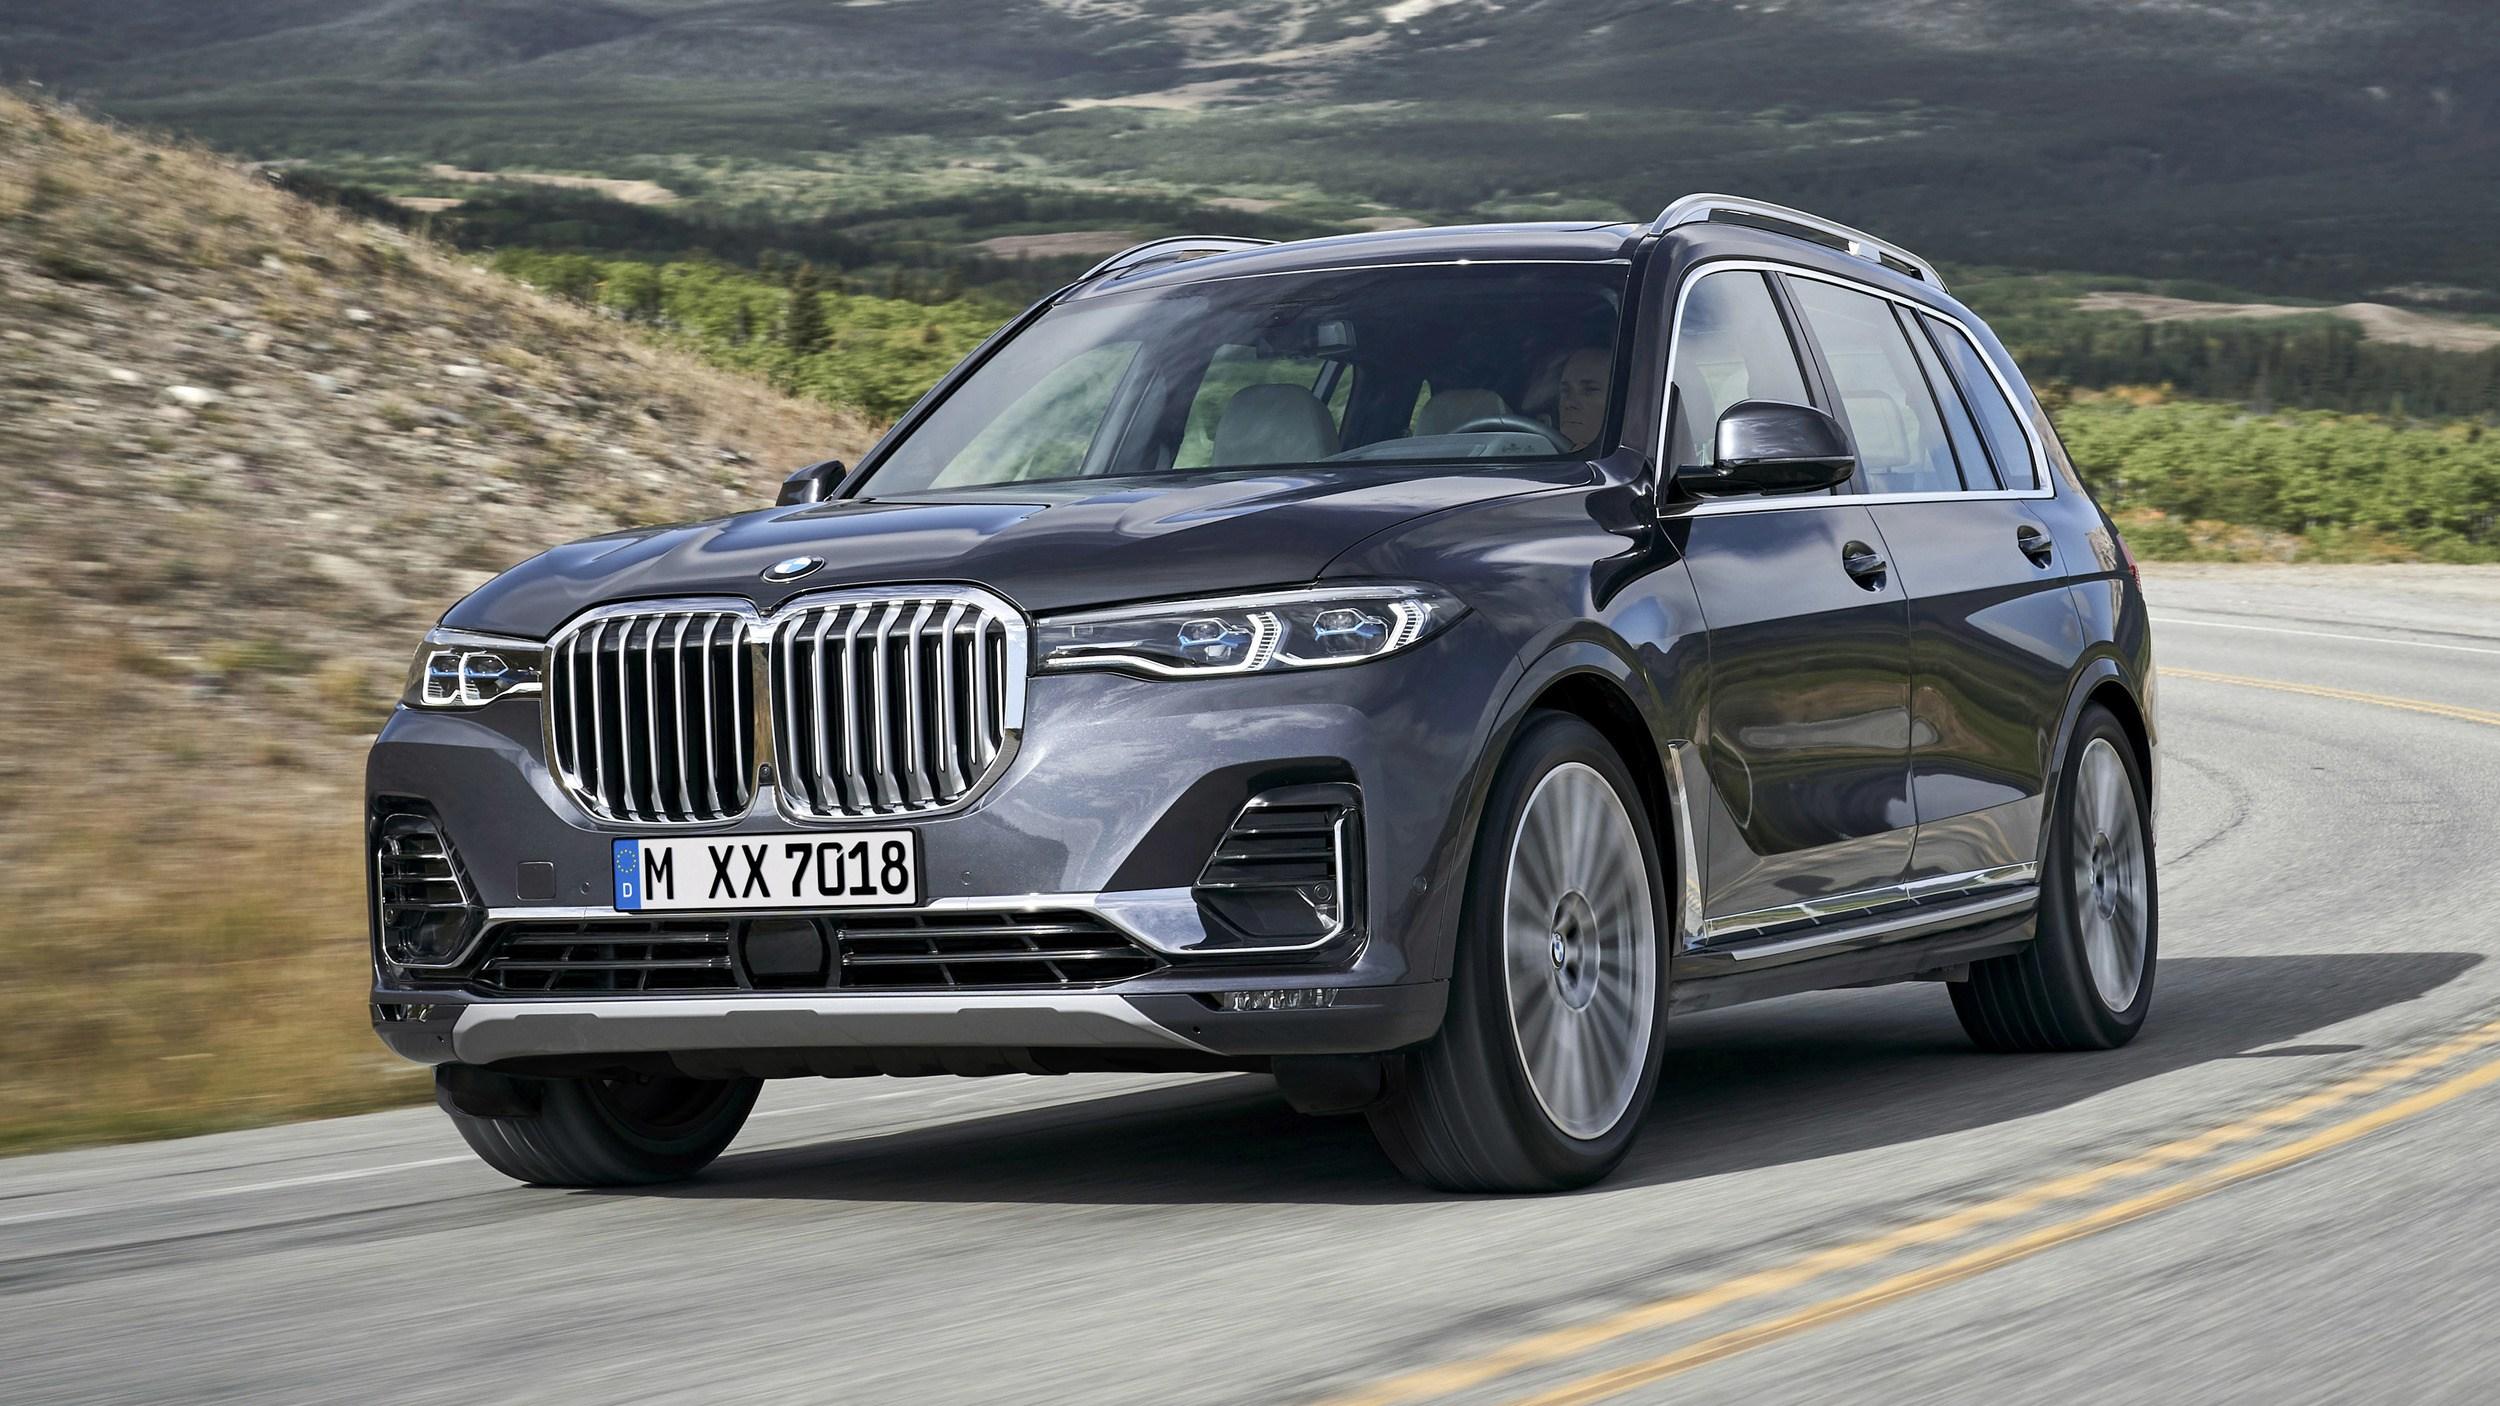 BMW SUV X7 Özellikleri, Fiyatı ve Çıkış Tarihi – BMW SUV X7 Alınır mı?